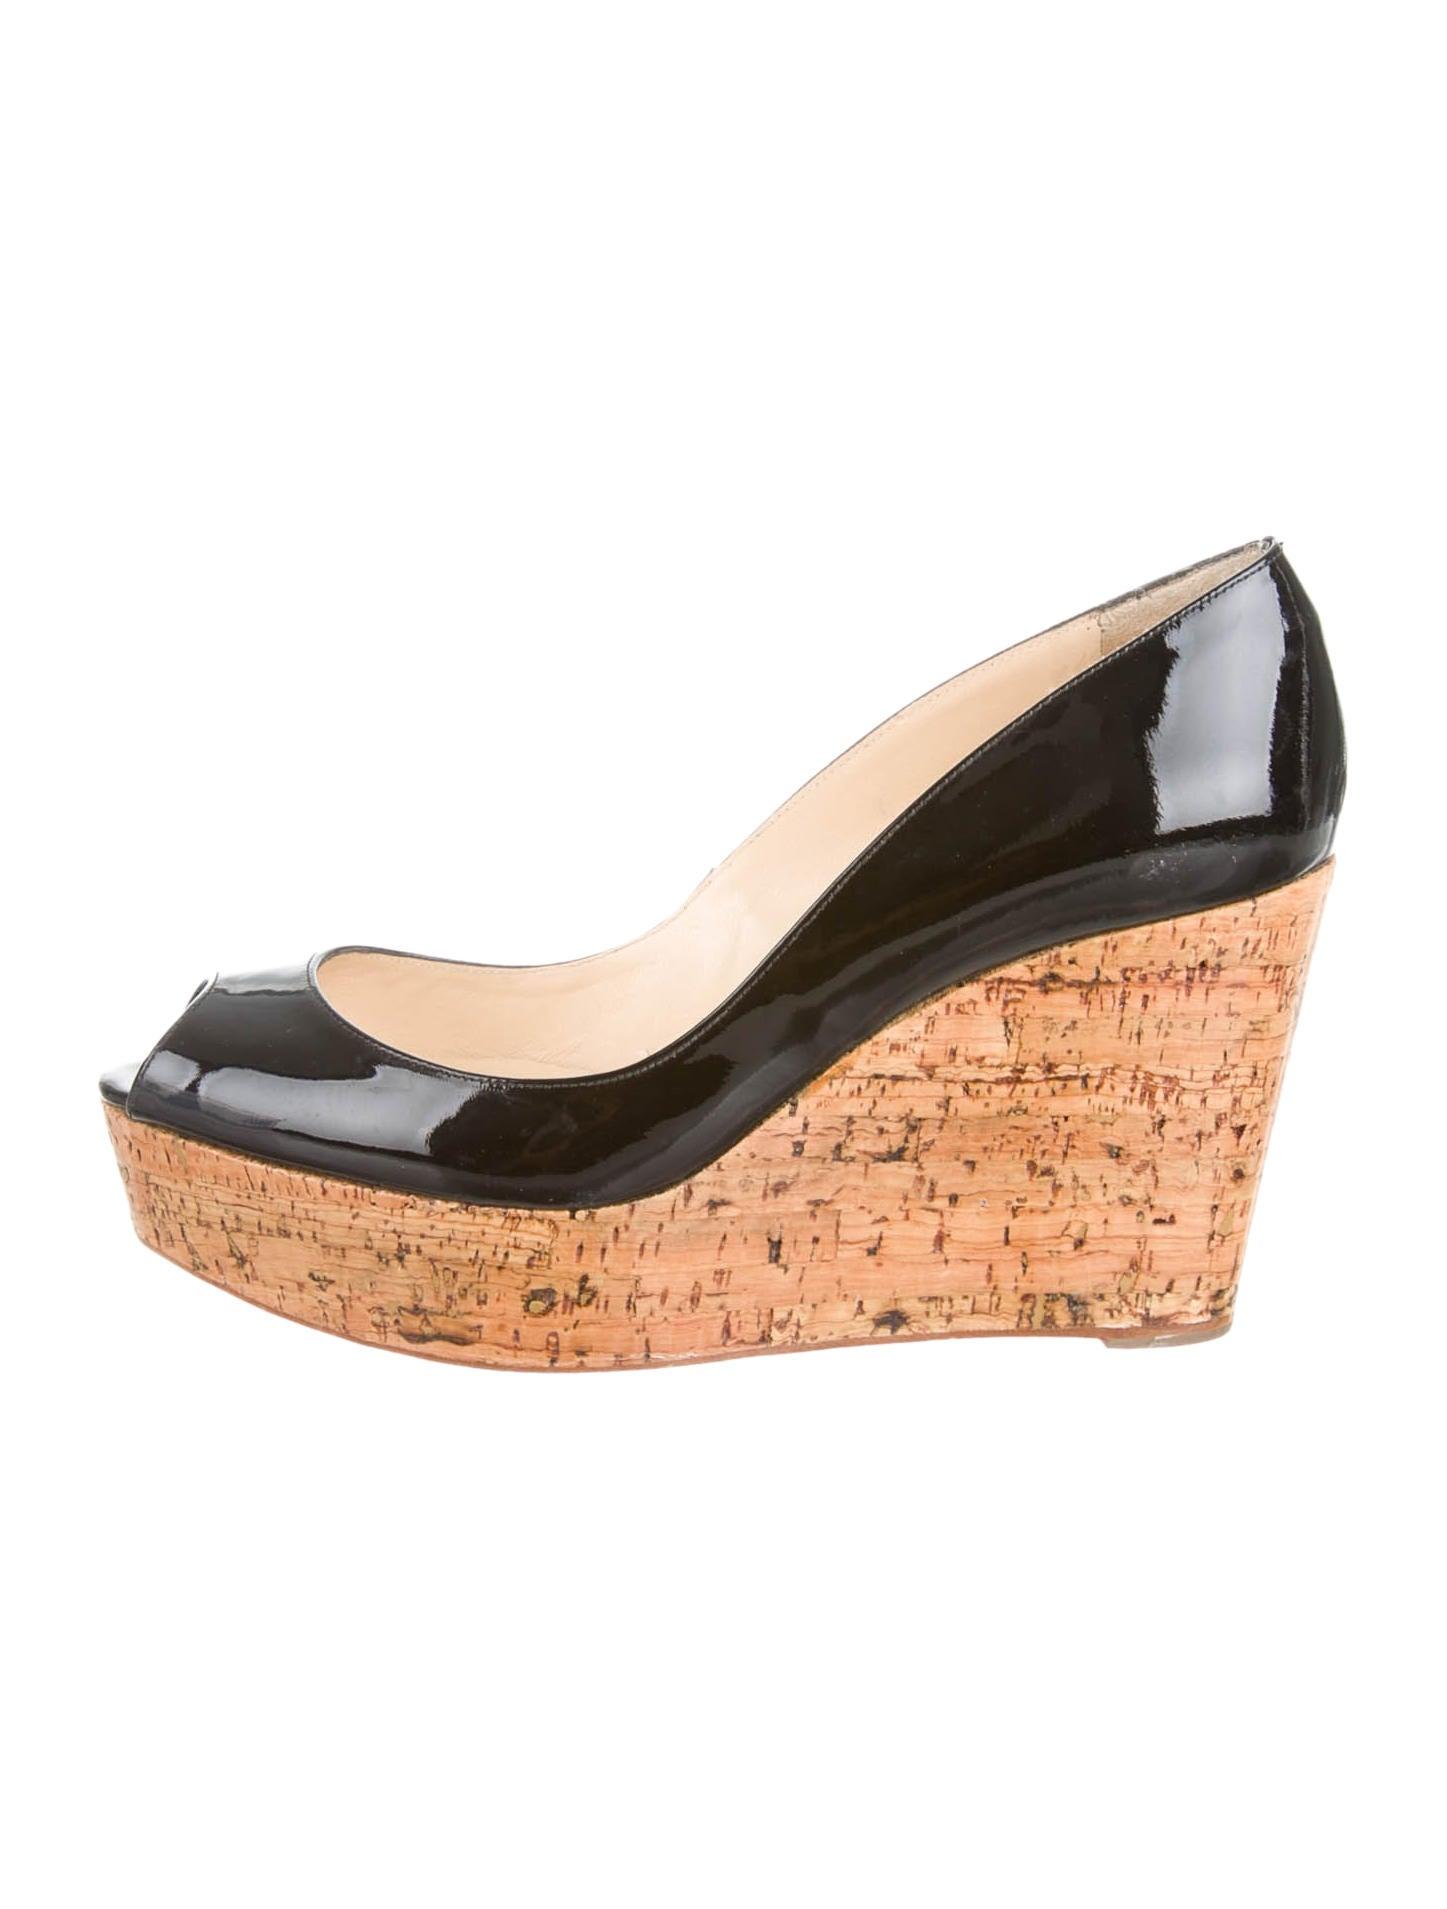 christian louboutin replicas - christian louboutin peep-toe wedges Black leather cork covered ...